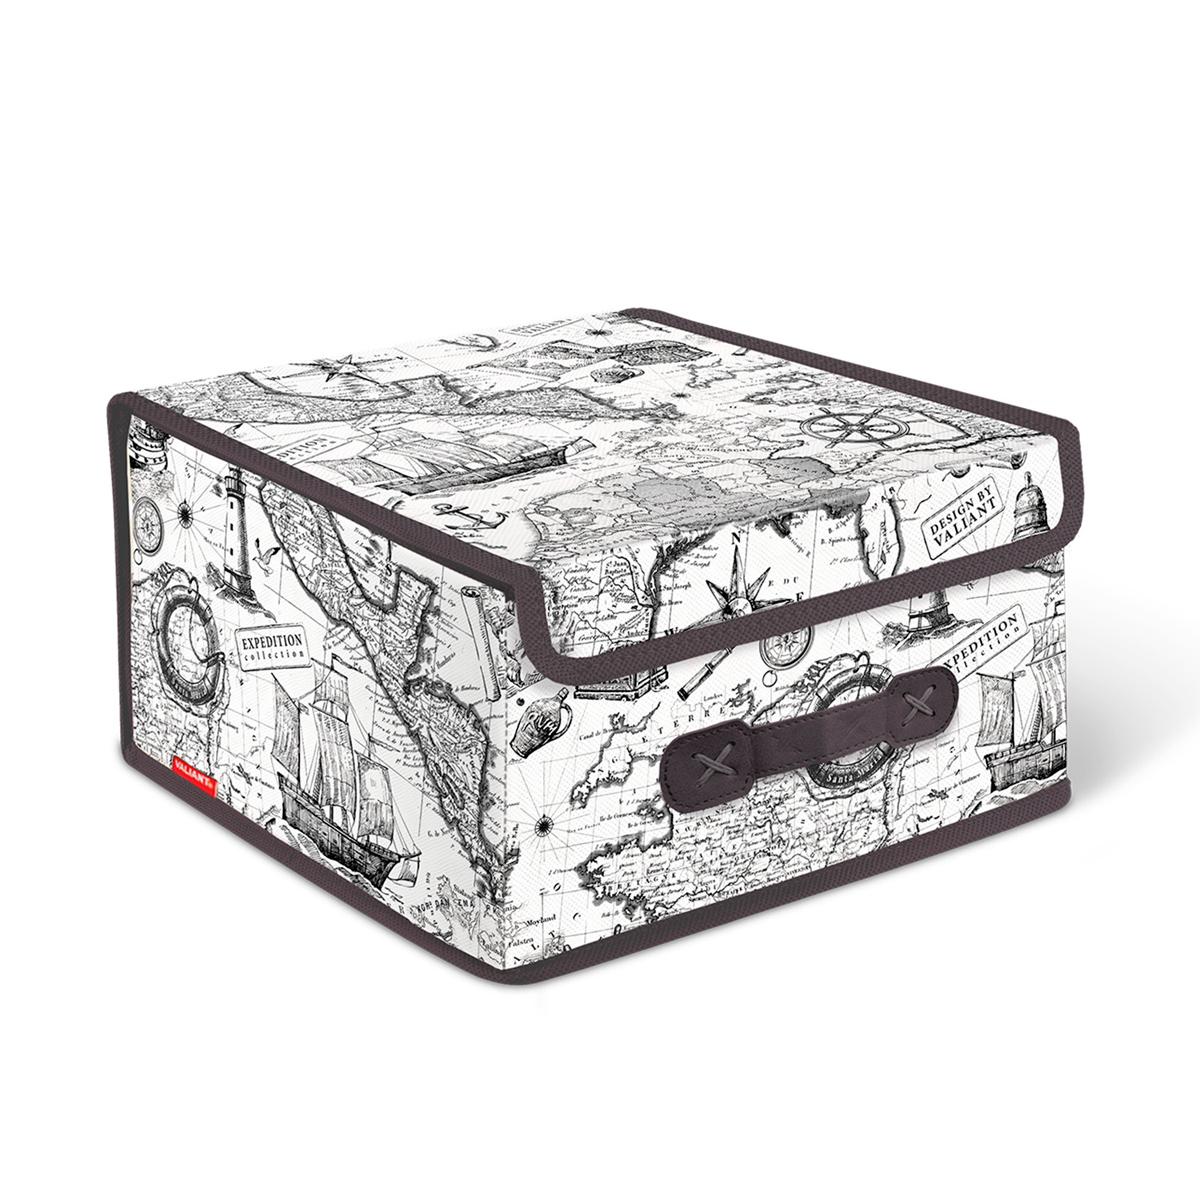 Короб стеллажный Valiant Expedition,  крышкой, 28 х 30  16 см